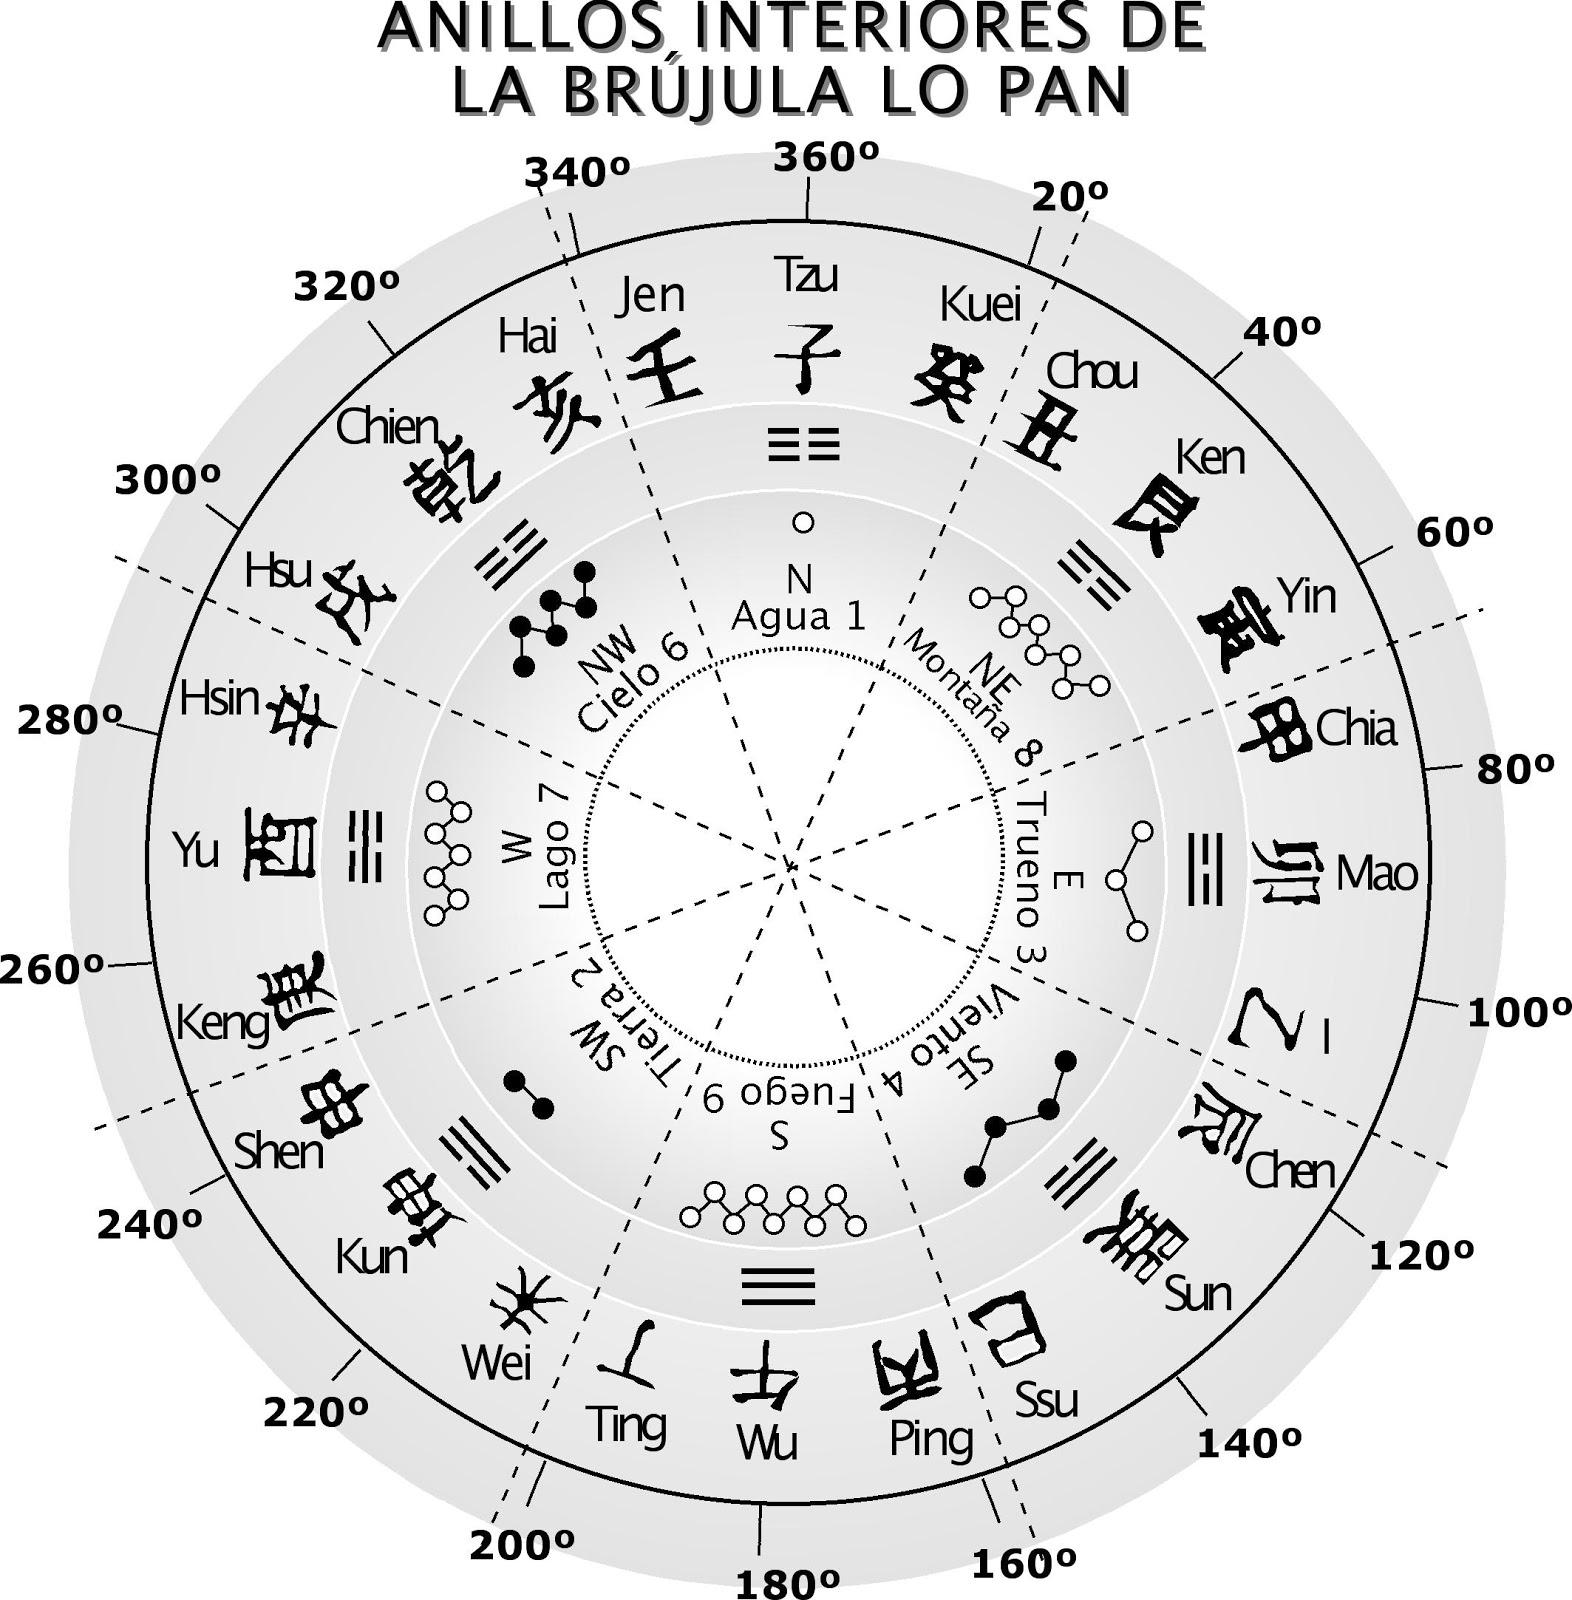 39 feng shui y geobiolog a huelva consultor a y formaci n - Brujula feng shui ...